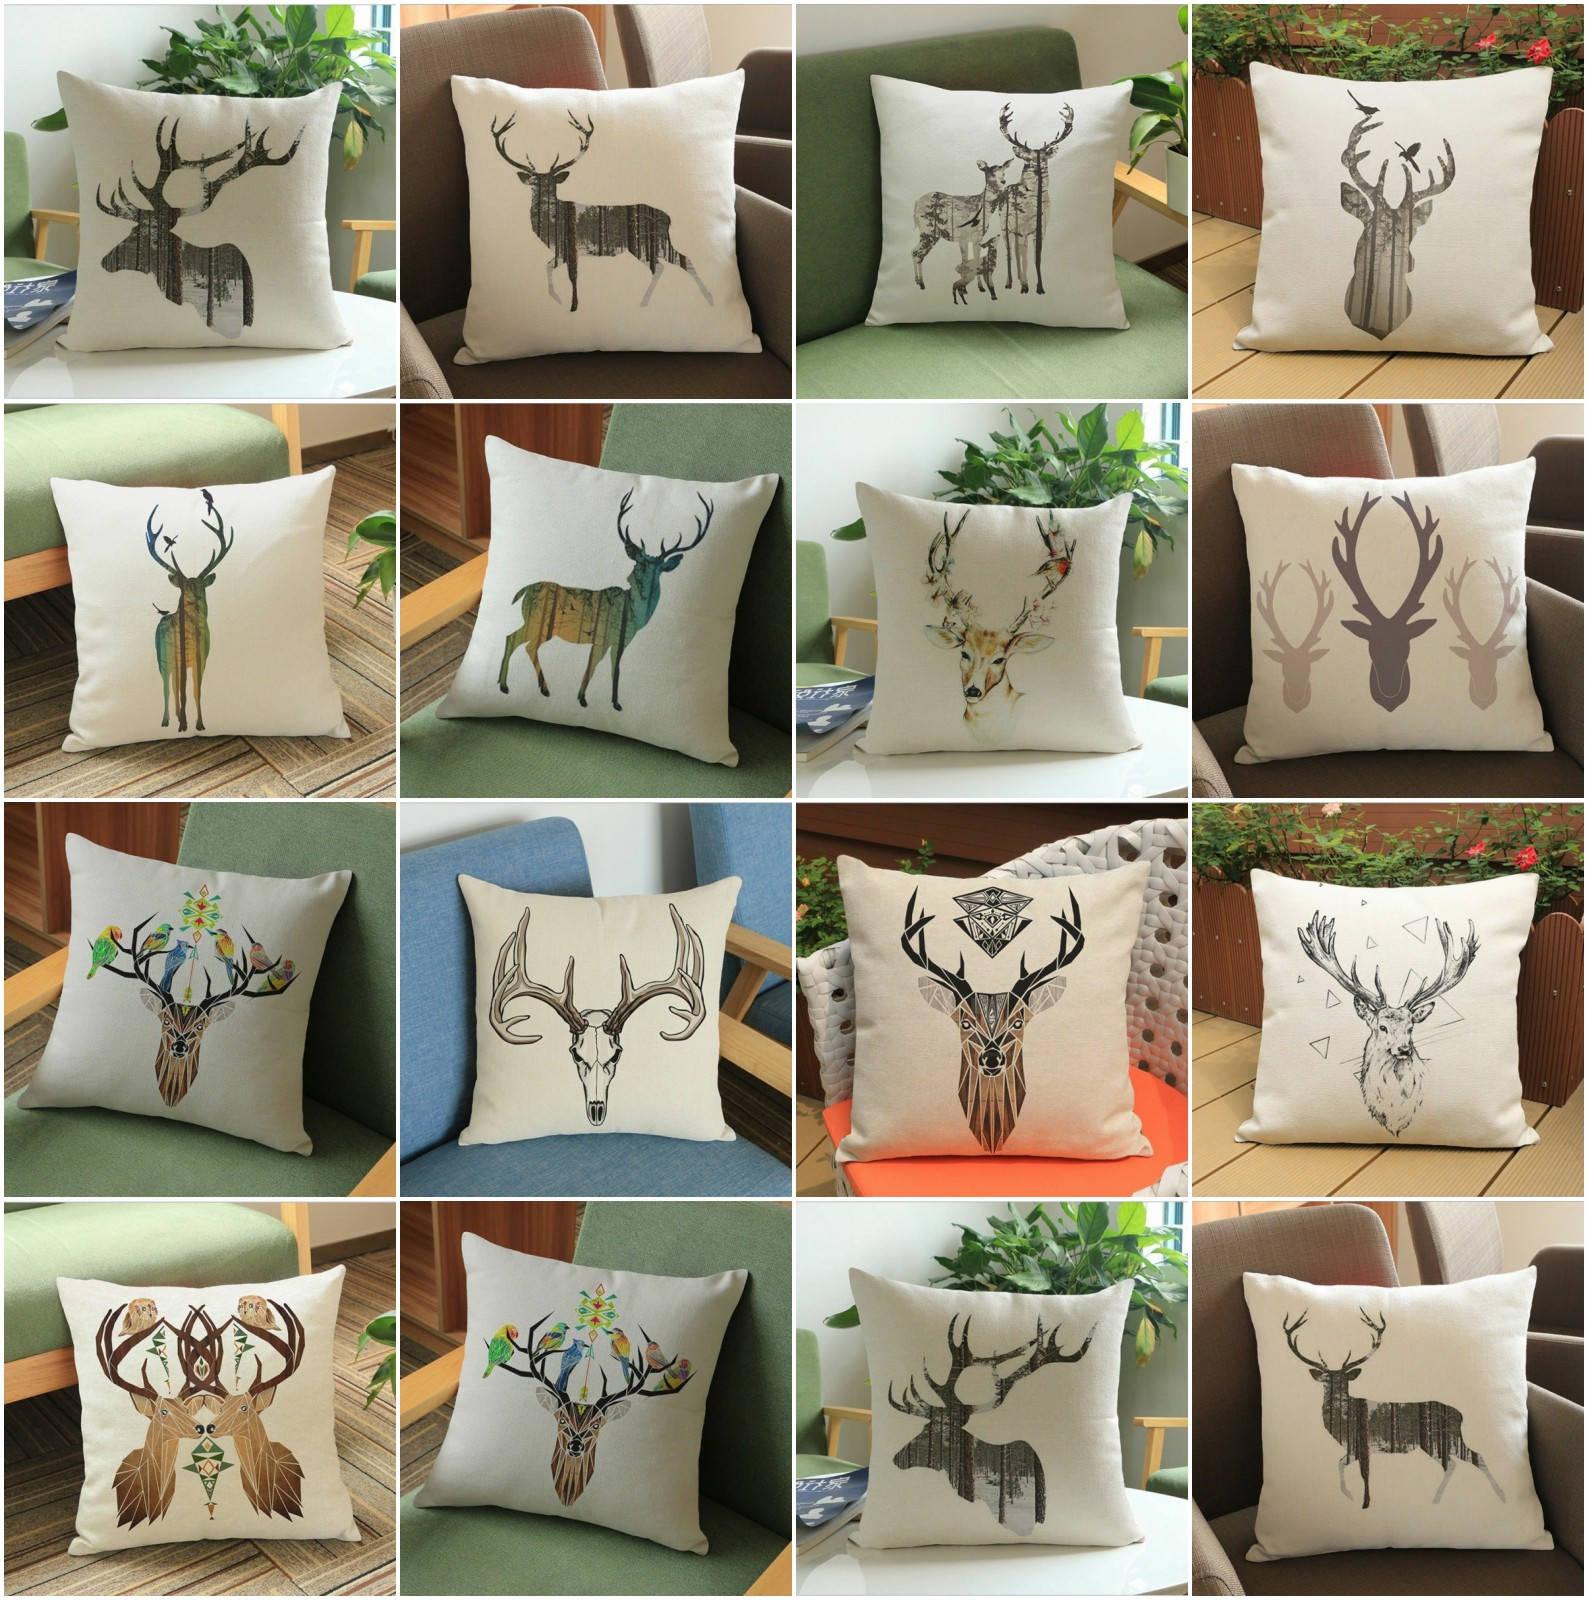 HGLEGYW  Christmas Elk Deer Printe Print Pillow Case Throw Pillowcase Cotton Linen Printed Pillow Covers Office Home Textile